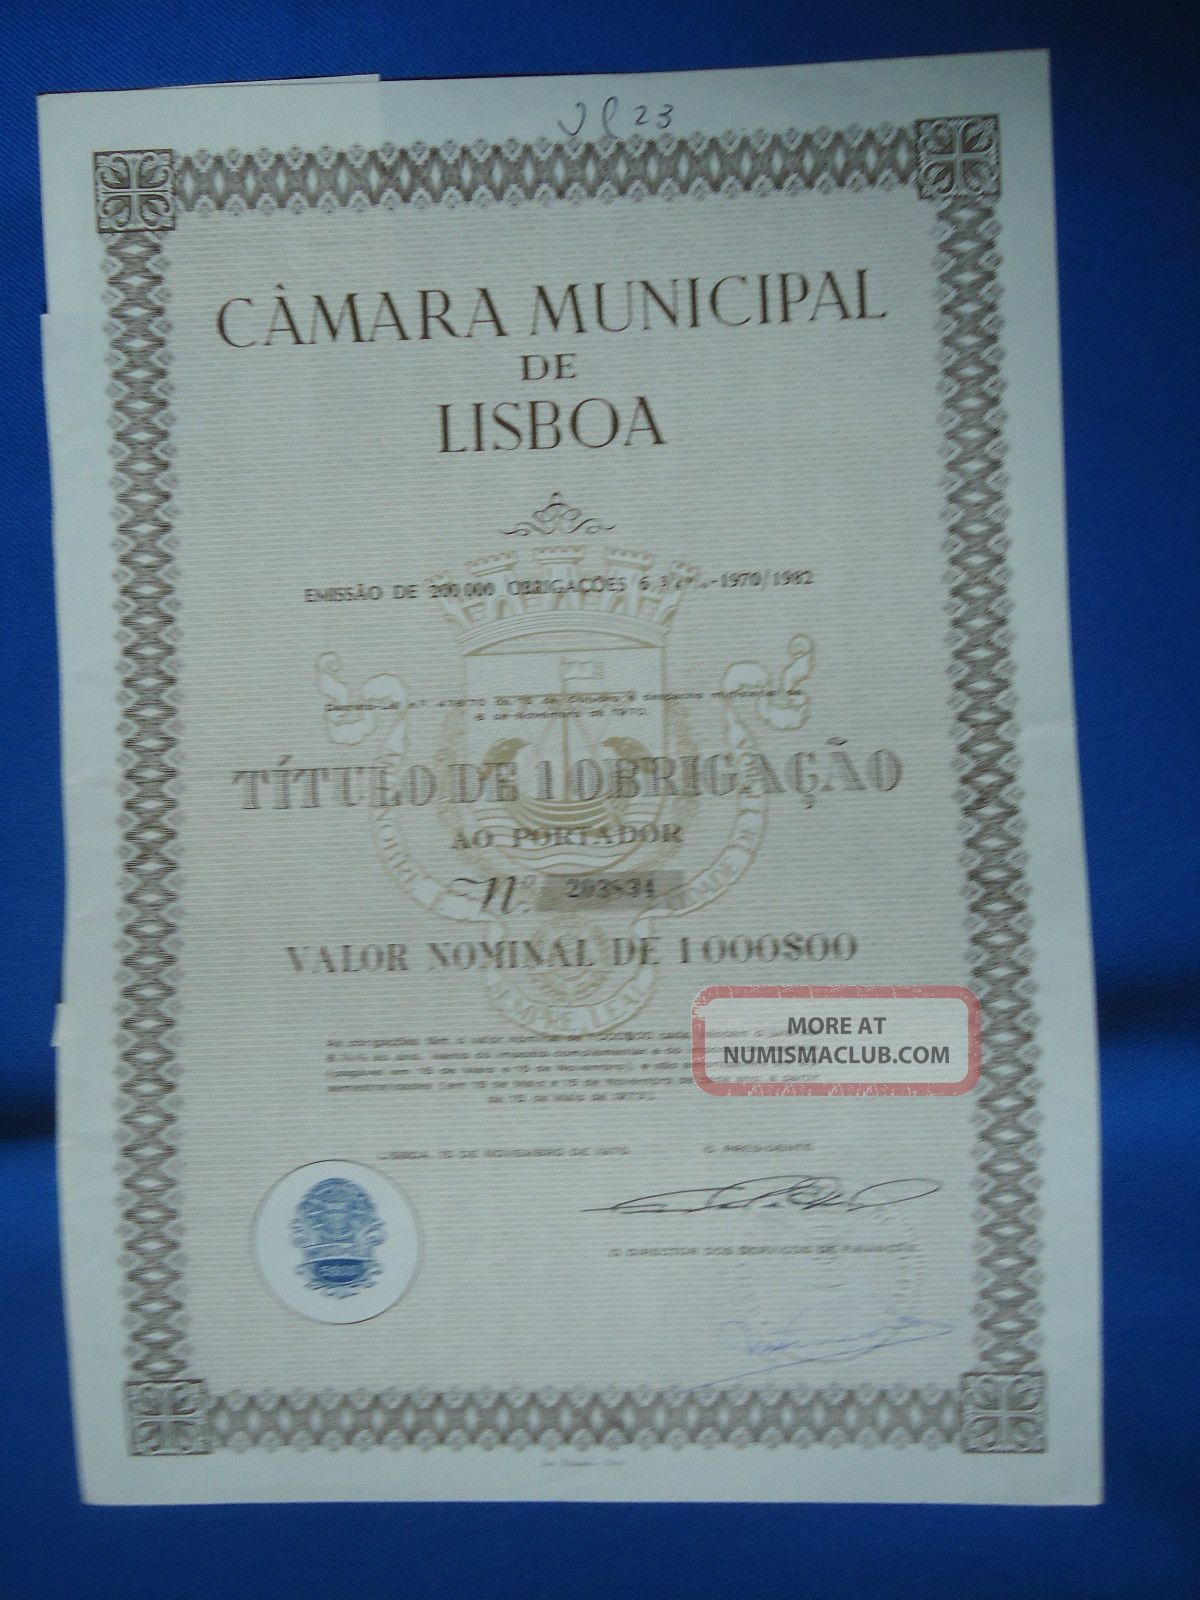 Portugal Share Camara Municipal De Lisboa 1000 Escudos 1970 Look Scans World photo